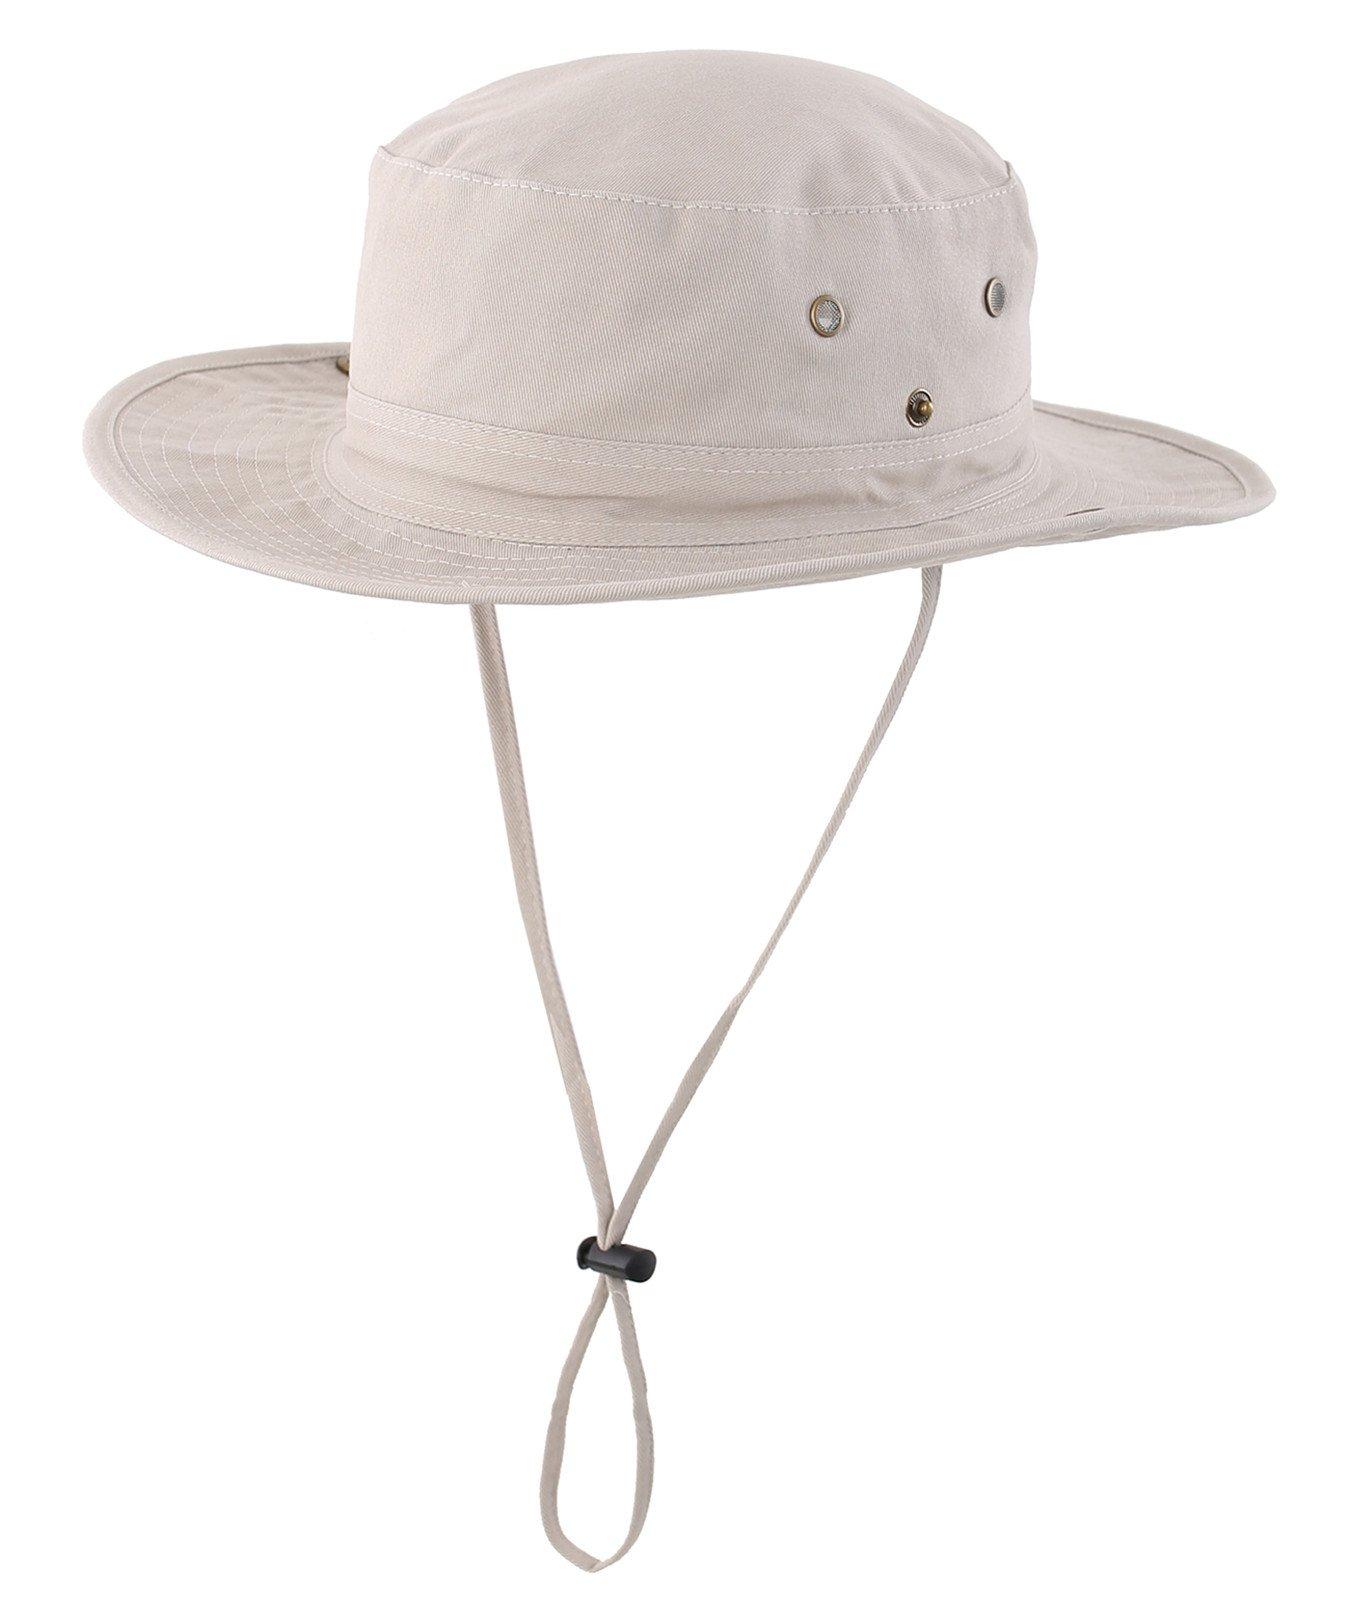 LLmoway Women Outdoor UPF50+ Boonie Hat Packable Breathable Cotton Bucket Sun Hat with String Khaki, Medium